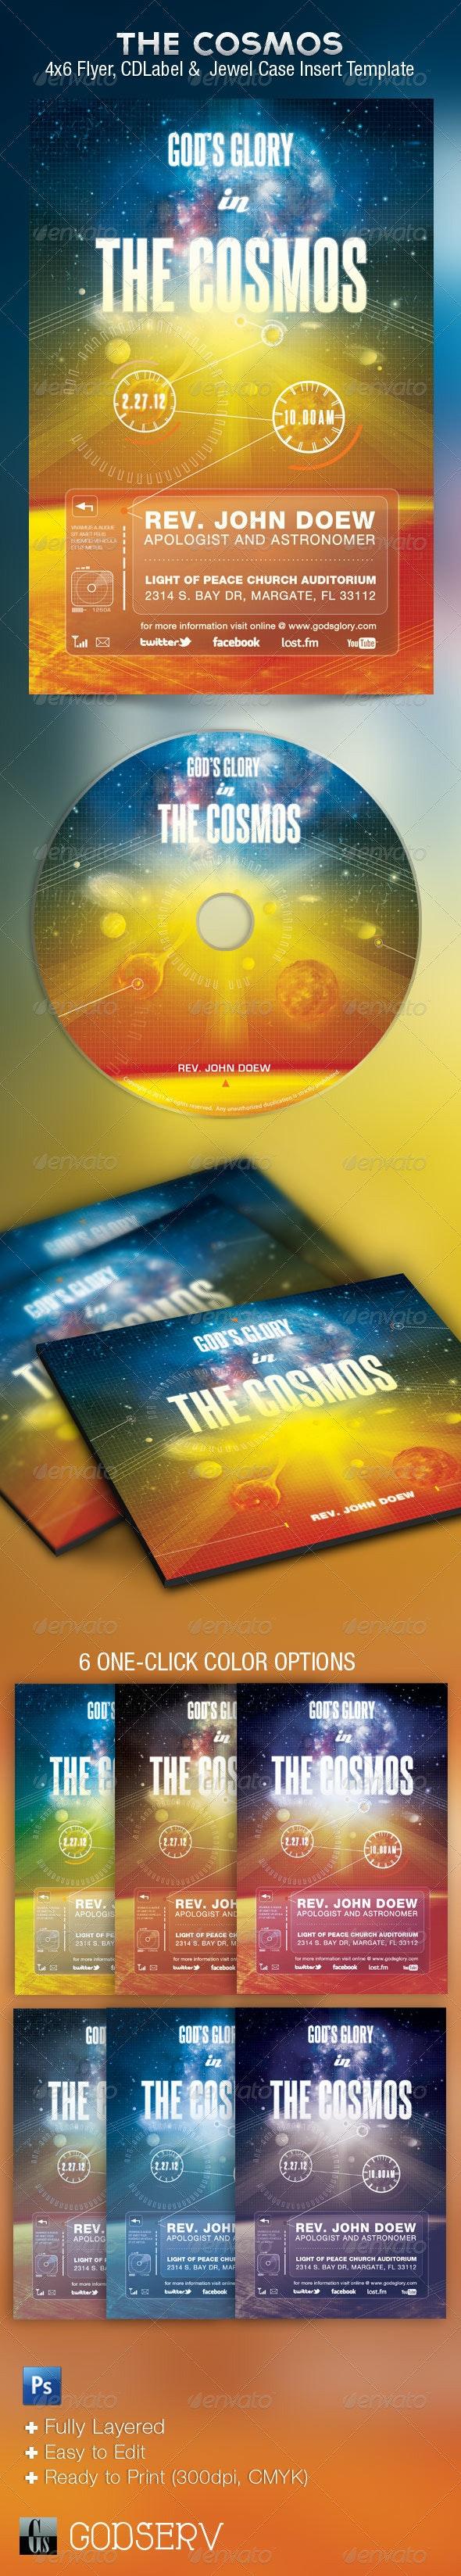 Glory Church Flyer CD Template - Church Flyers